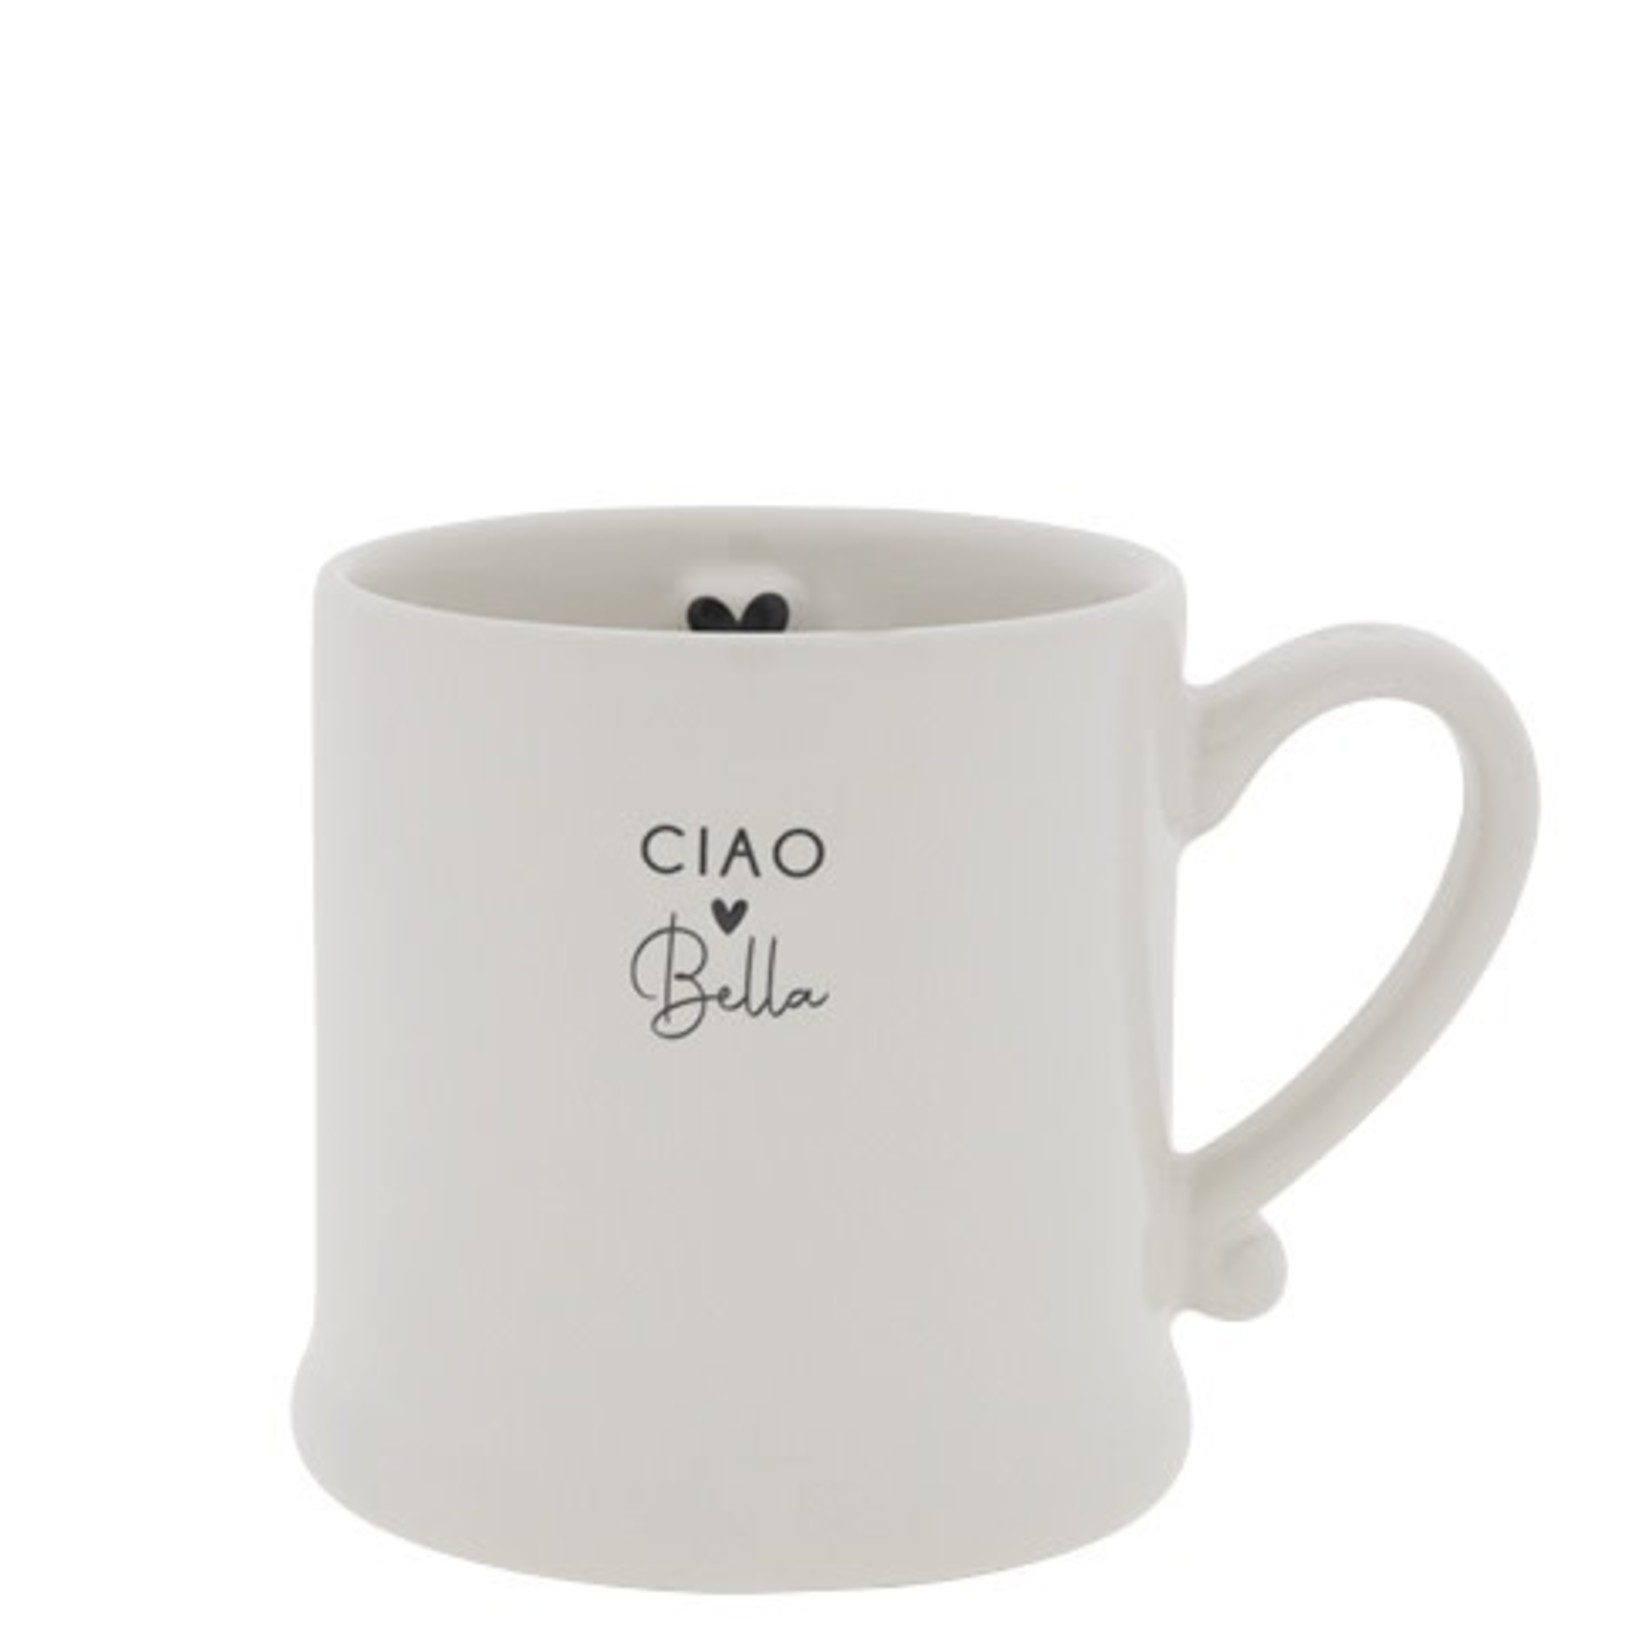 Bastion Collections Mug Ciao Bella white/black 8x7 cm